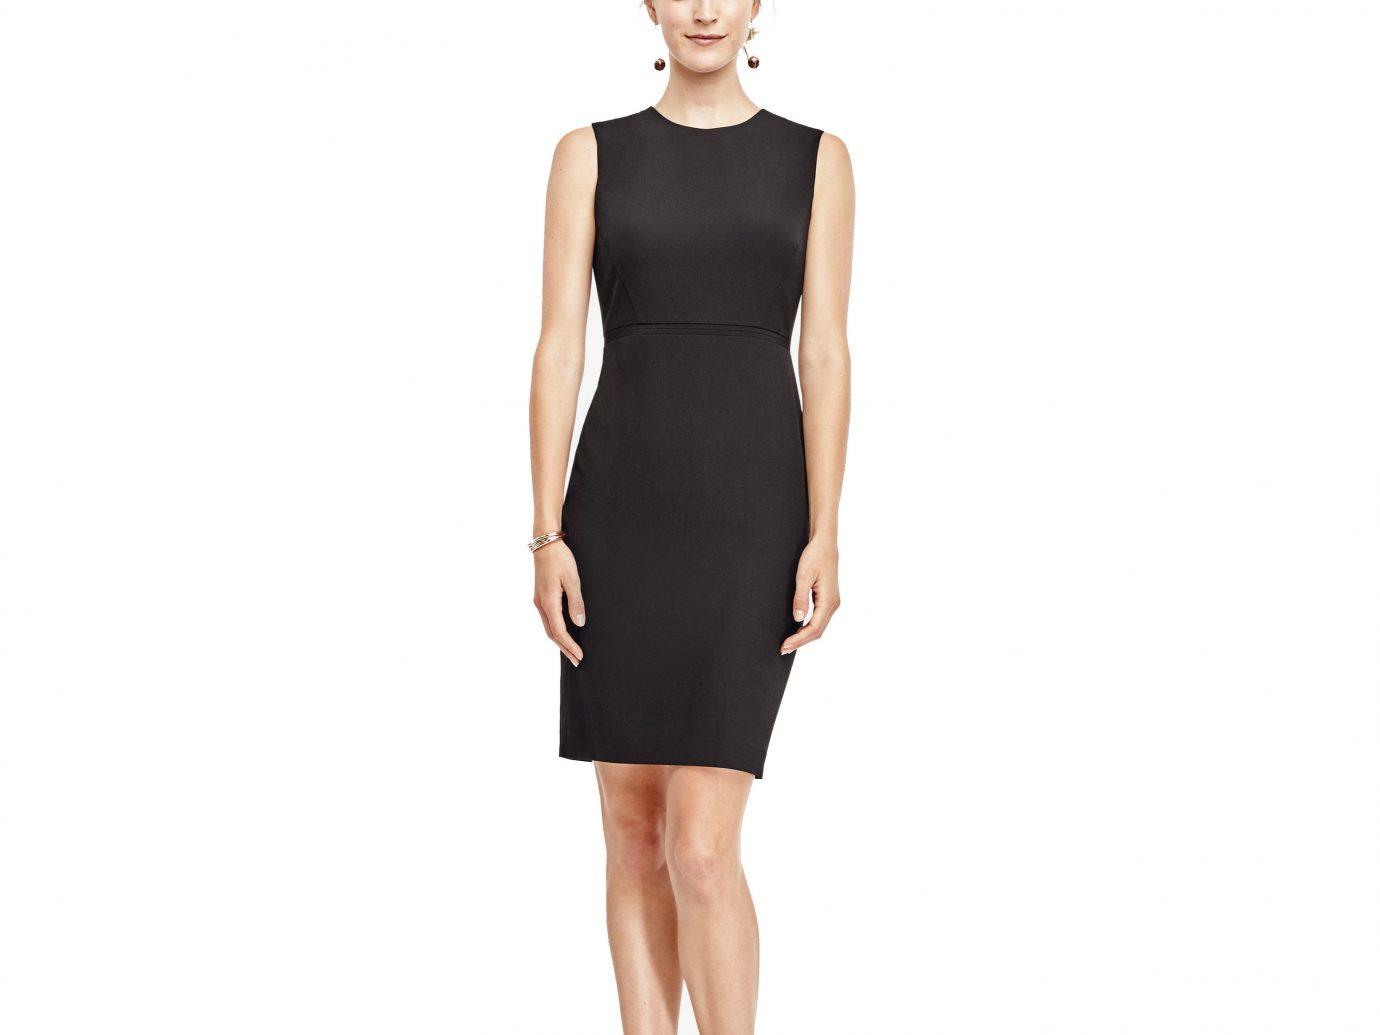 Style + Design clothing dress day dress sleeve cocktail dress little black dress gown neck formal wear textile human body abdomen posing